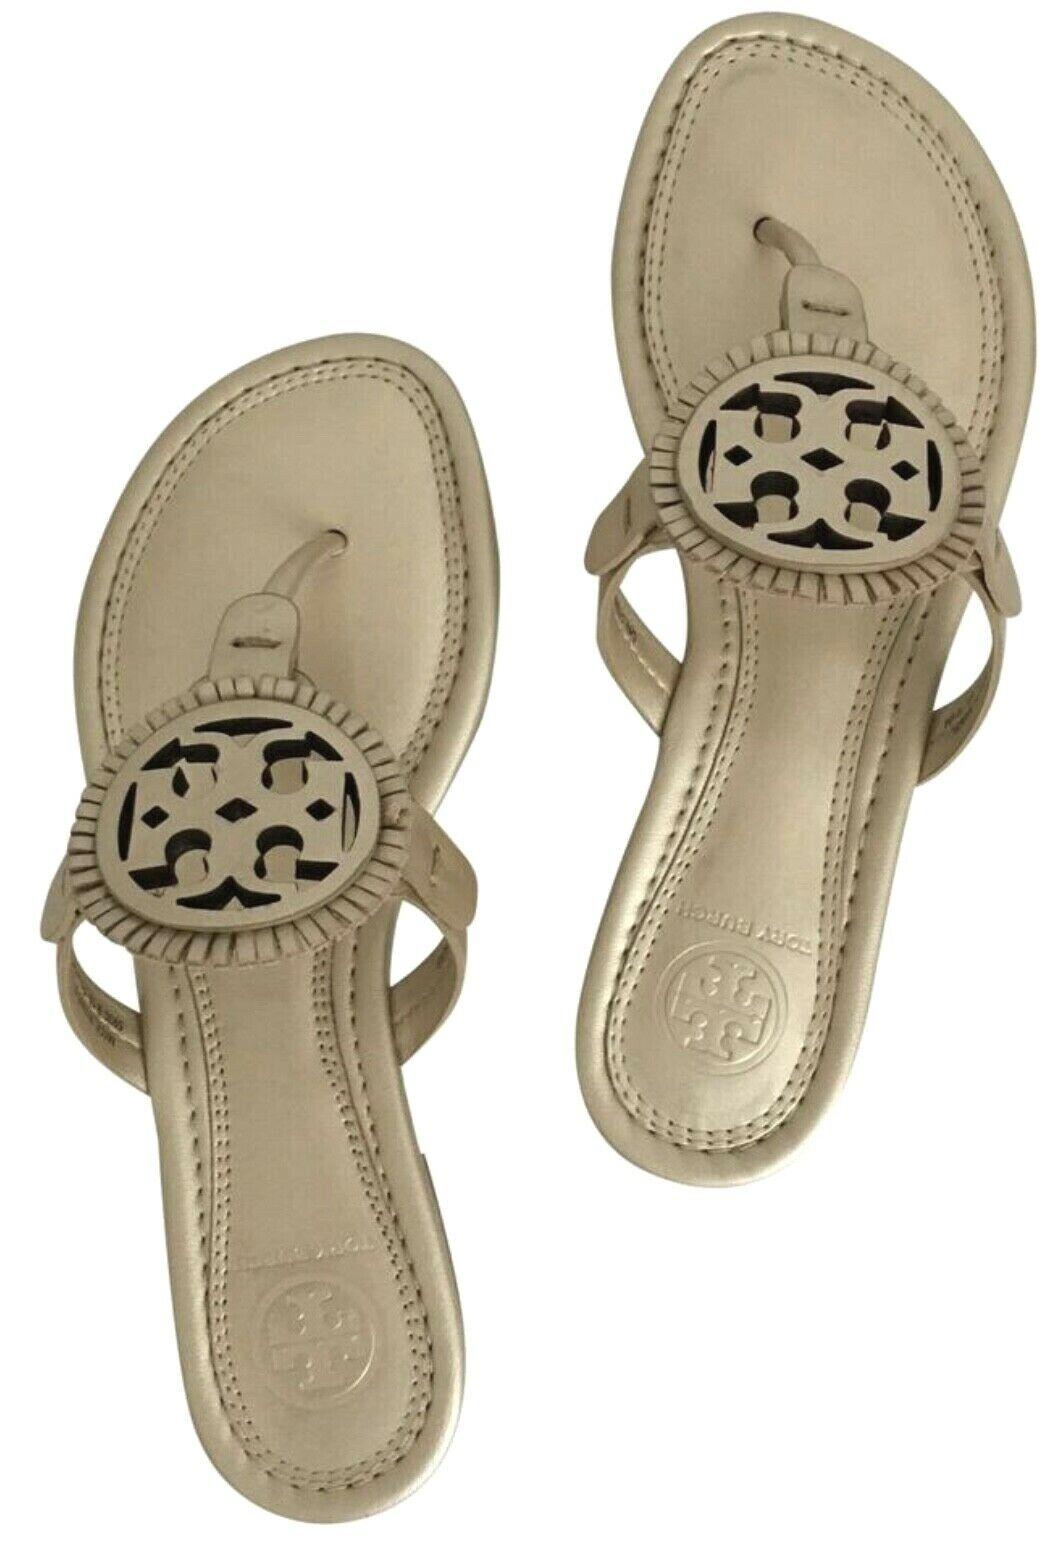 Tory Burch NEW Miller Fringe Platinum Metallic Logo Sandals Sizes 6 6.5 Auth